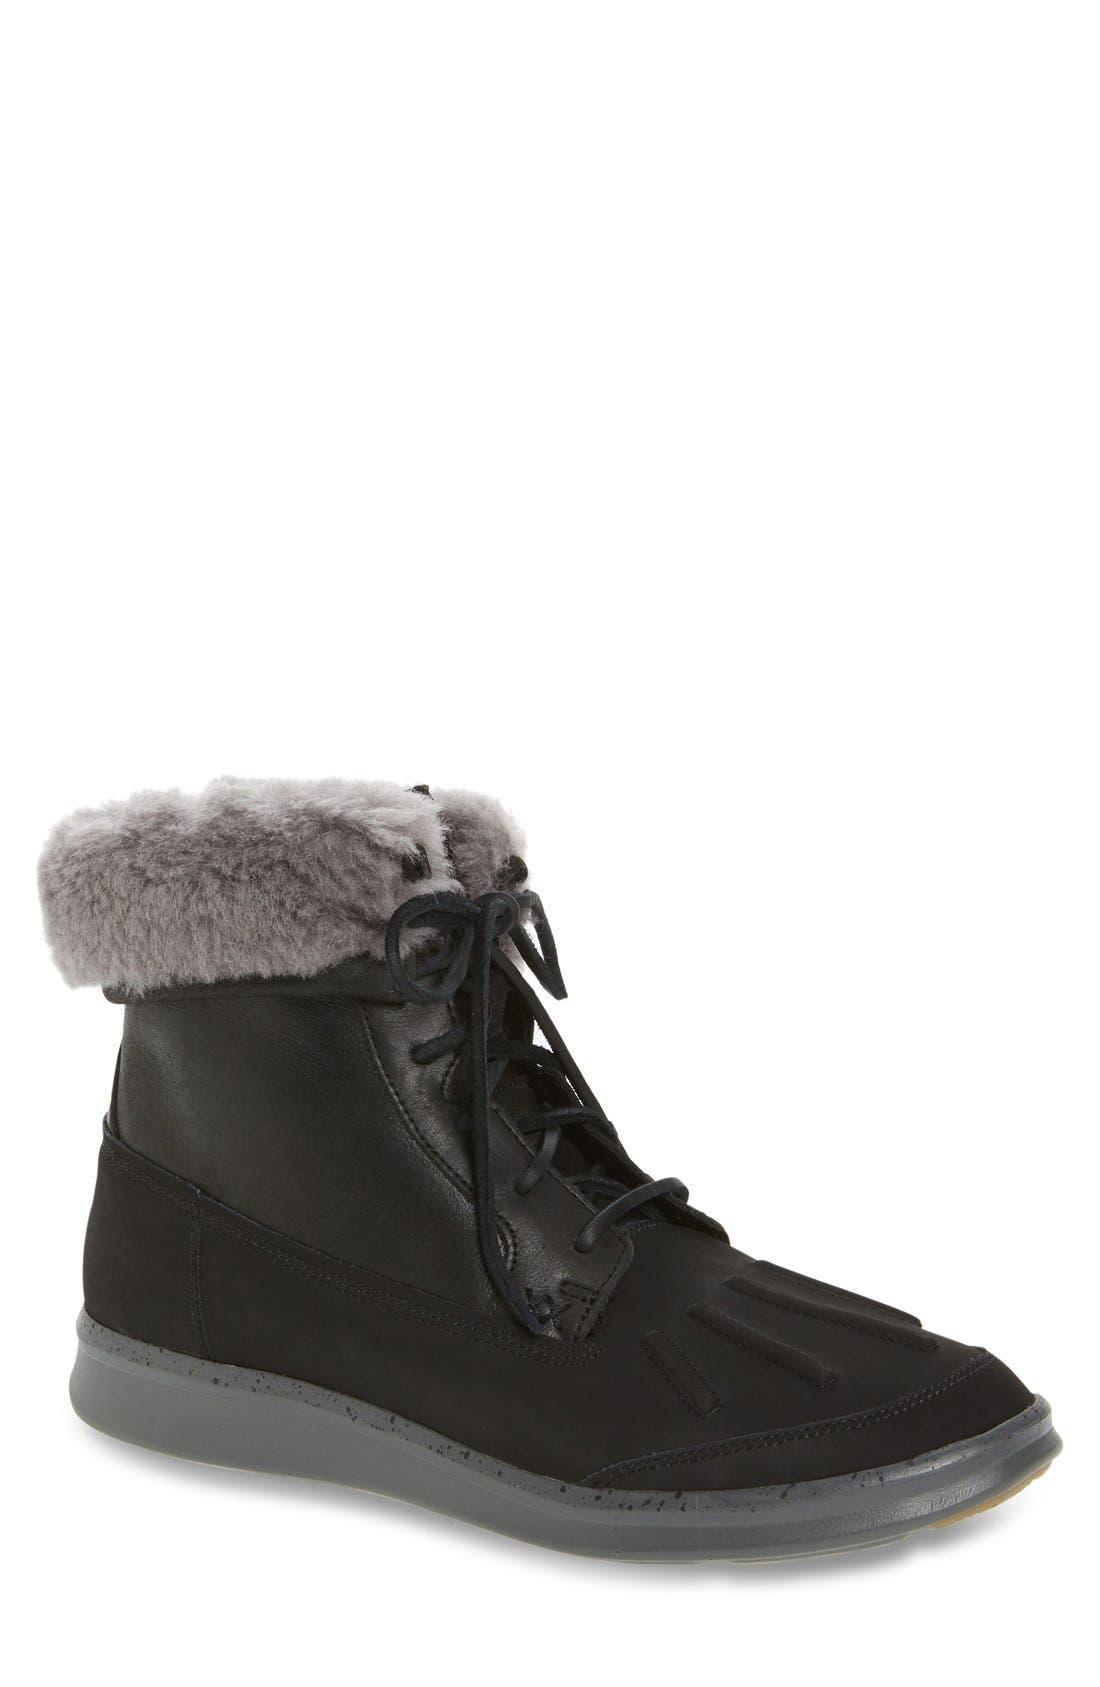 Roskoe Snow Boot,                             Main thumbnail 1, color,                             001